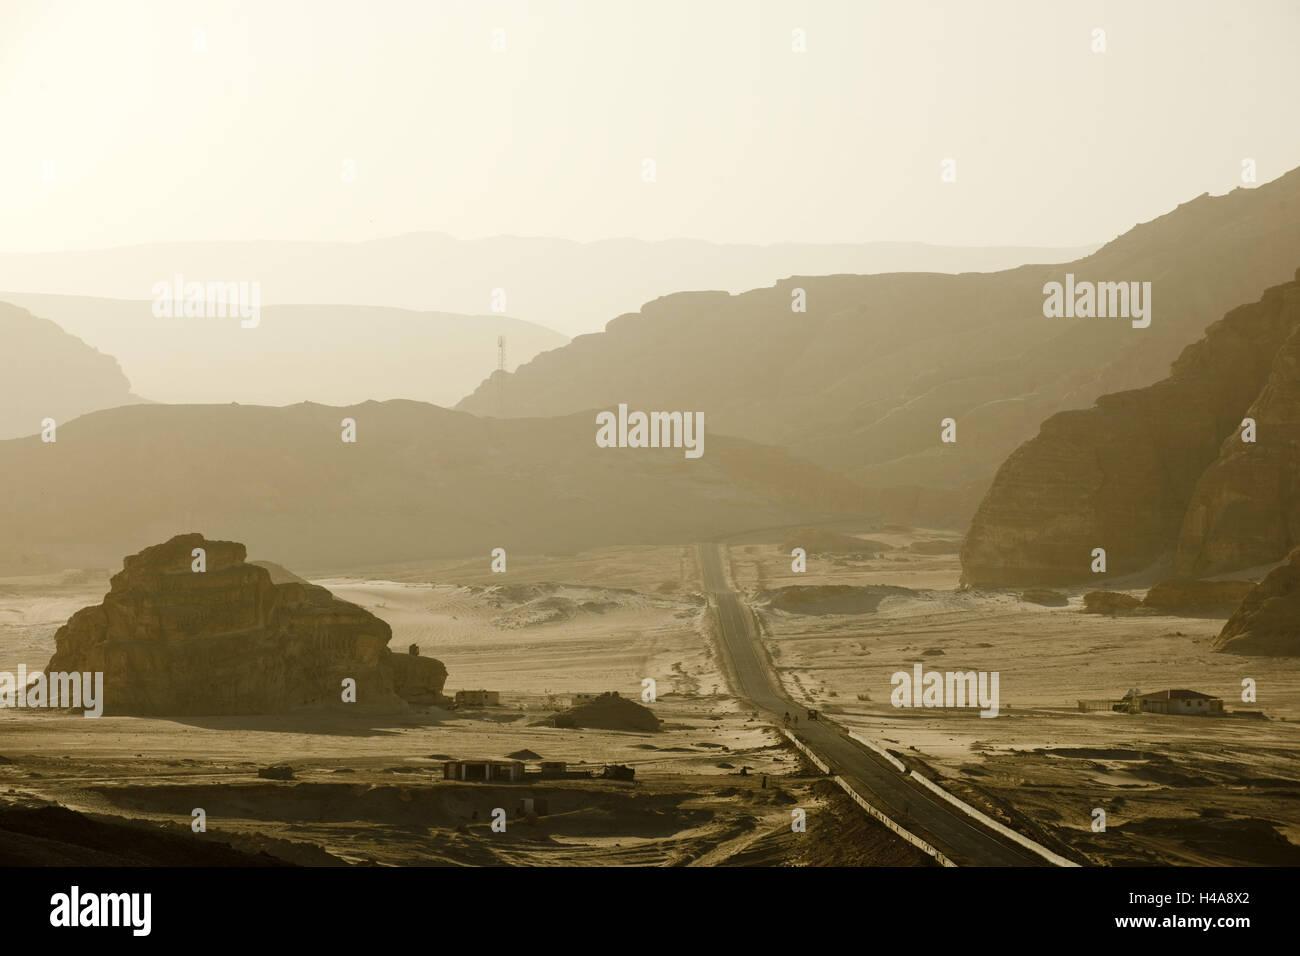 Egypt, Sinai, Wüstenstrasse Milga to Nuweiba on the east coast, Stock Photo